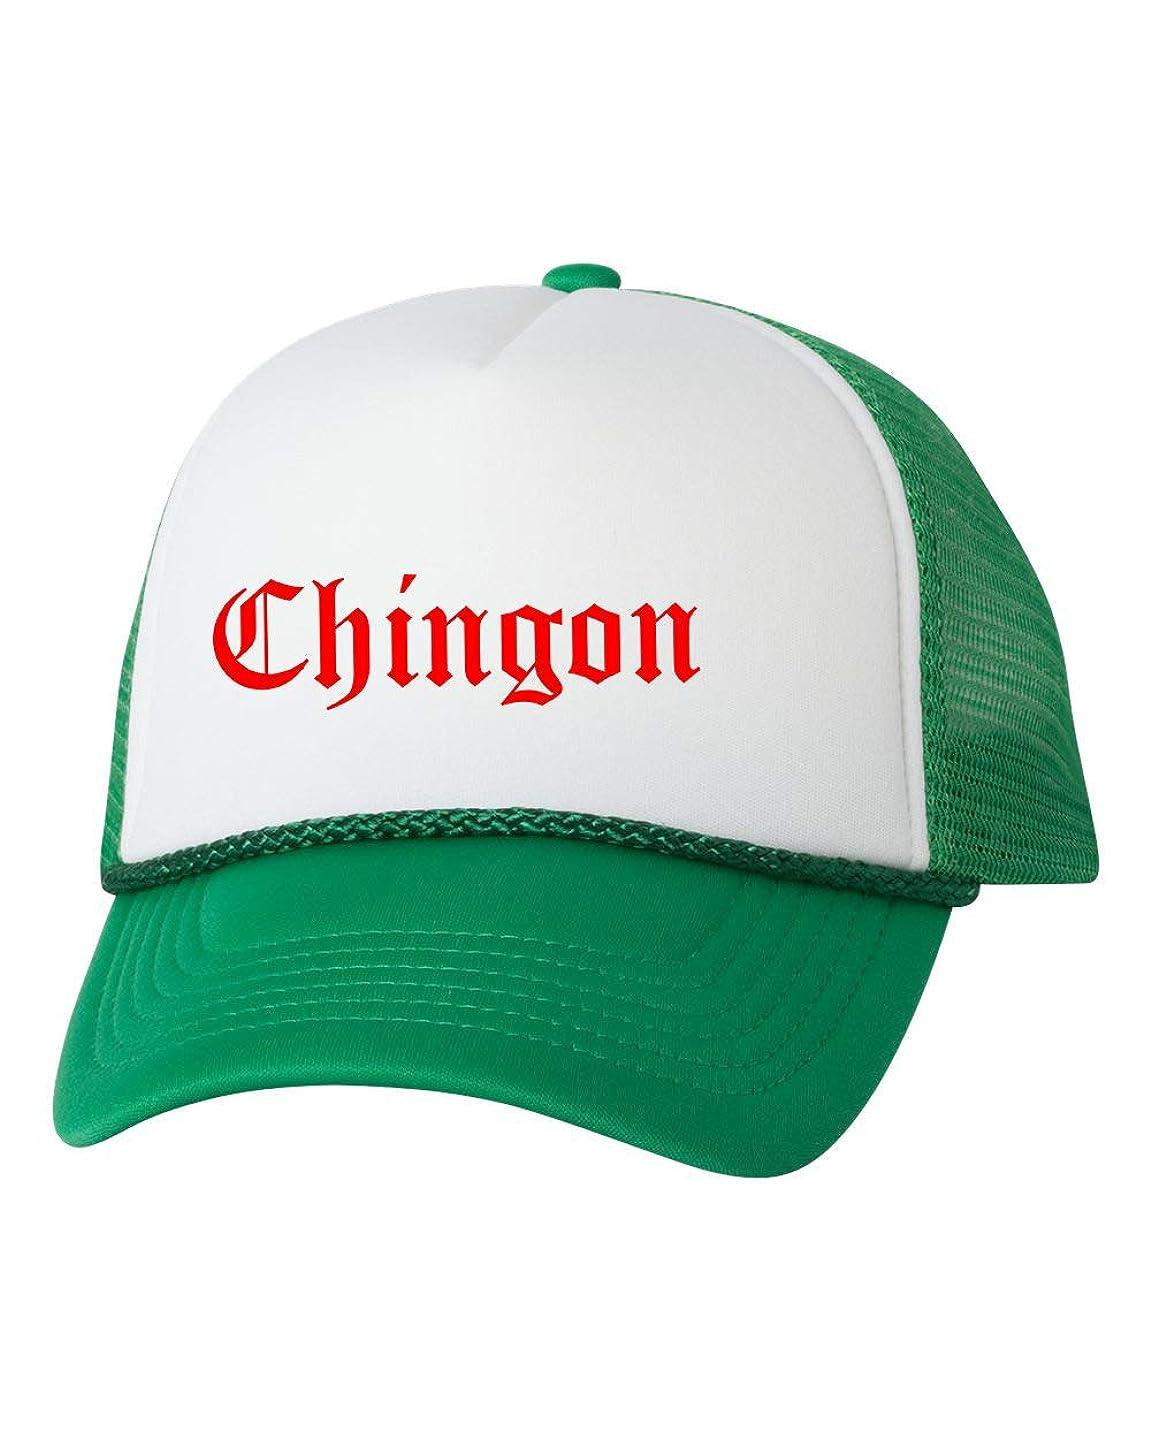 Ameritrends Chingon Trucker Hat Cap Adjustable Snapback New